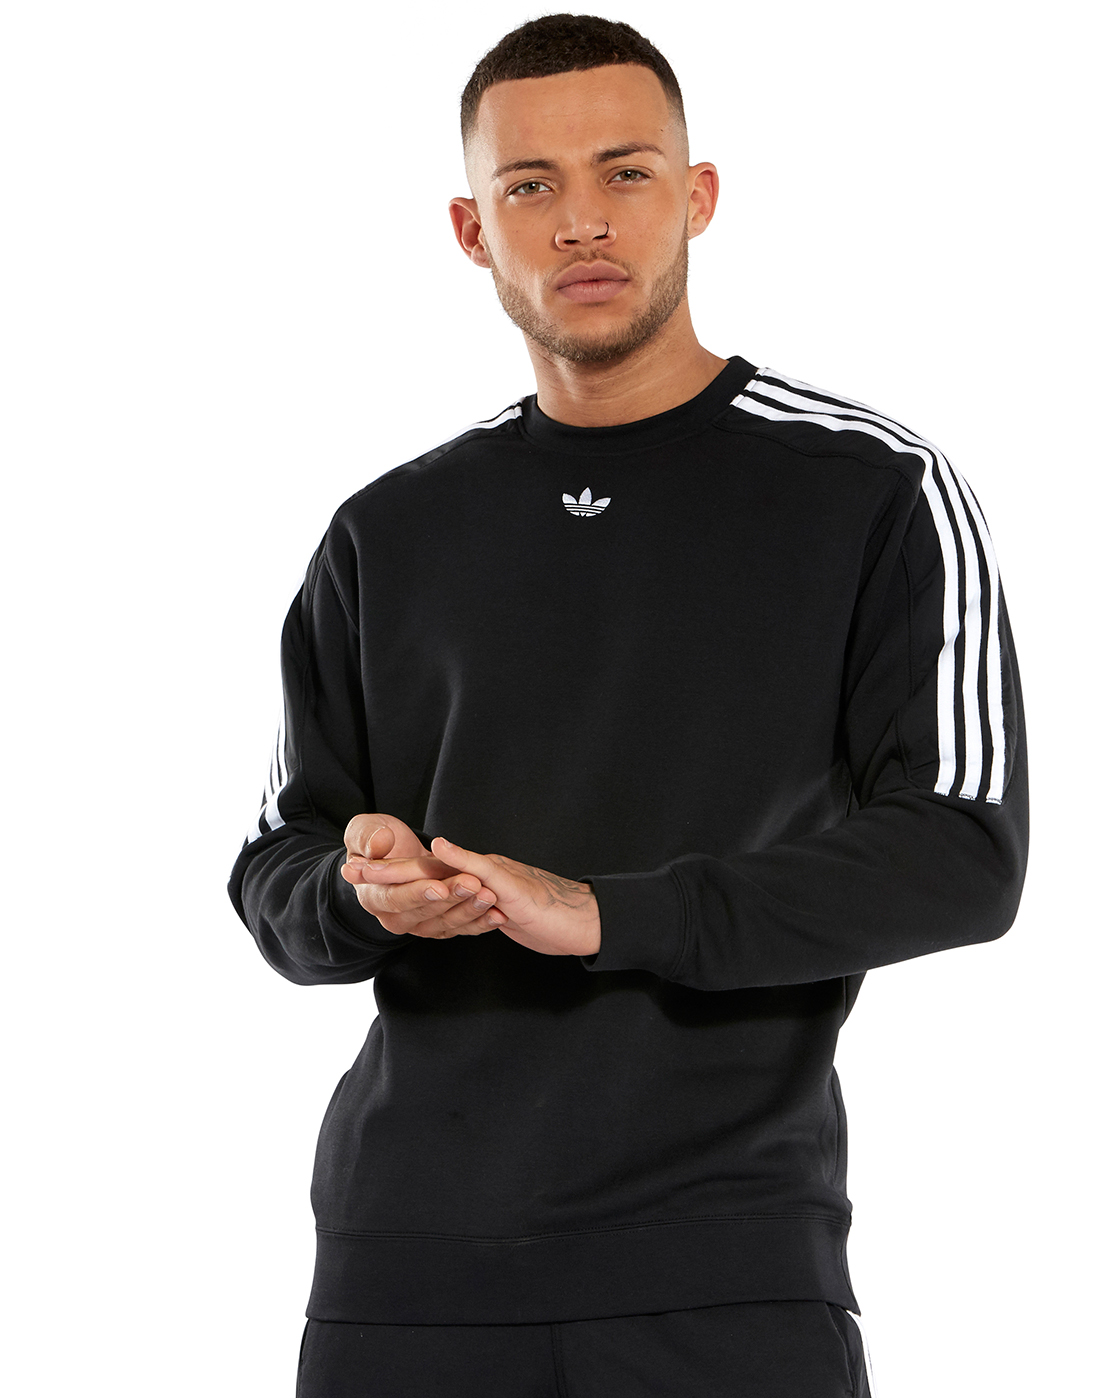 650dde4518b Men's Black adidas Originals Radkin Sweatshirt | Life Style Sports